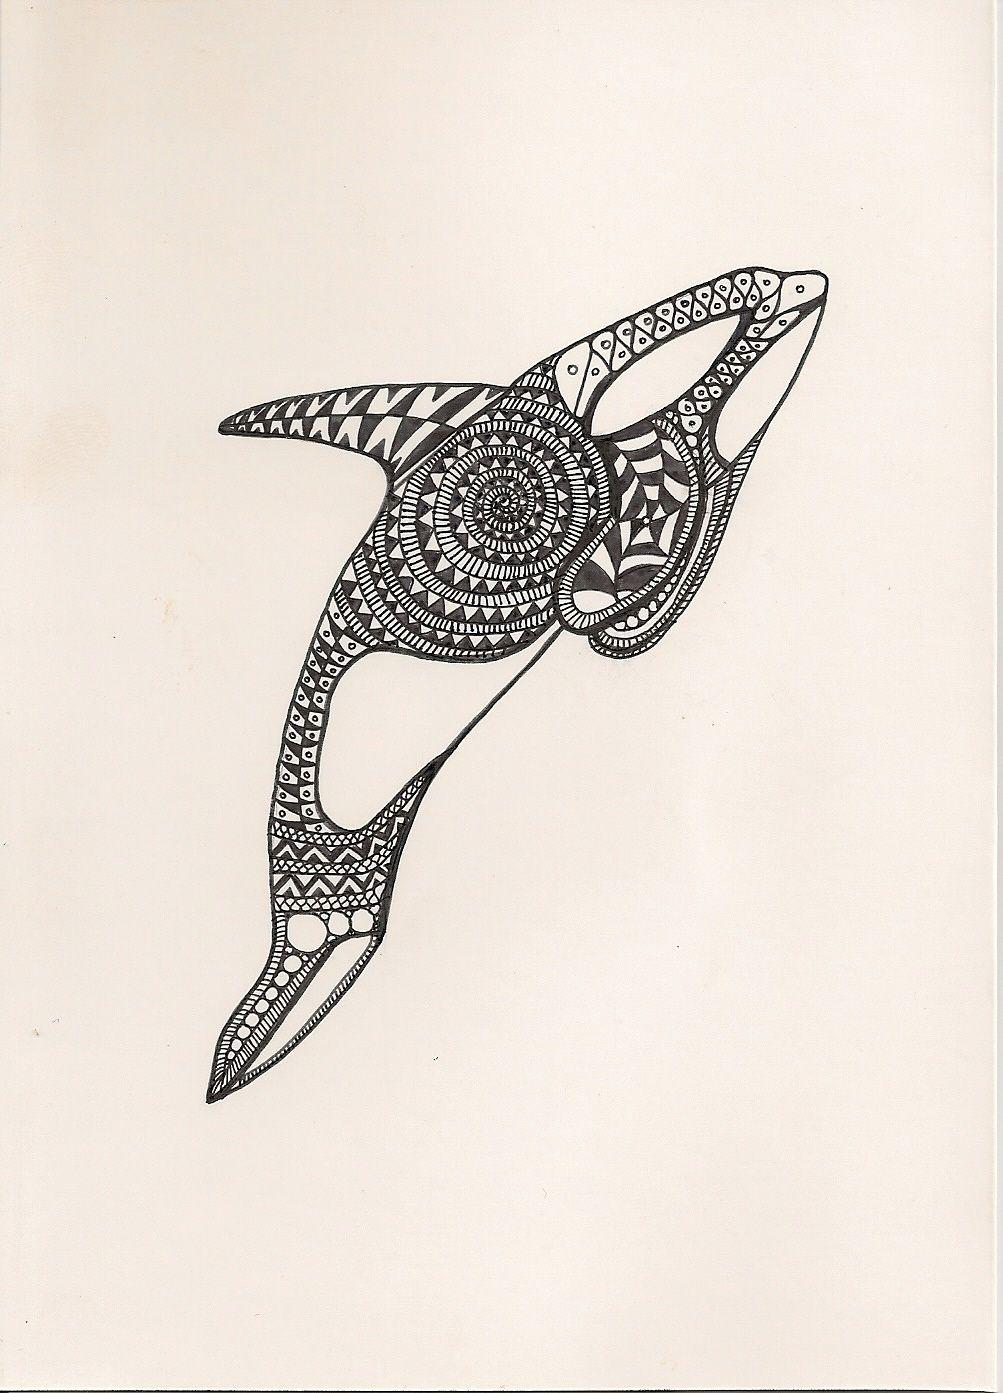 Abstract Orca by Gotezz.deviantart.com on @deviantART | Tattoo ideas ...